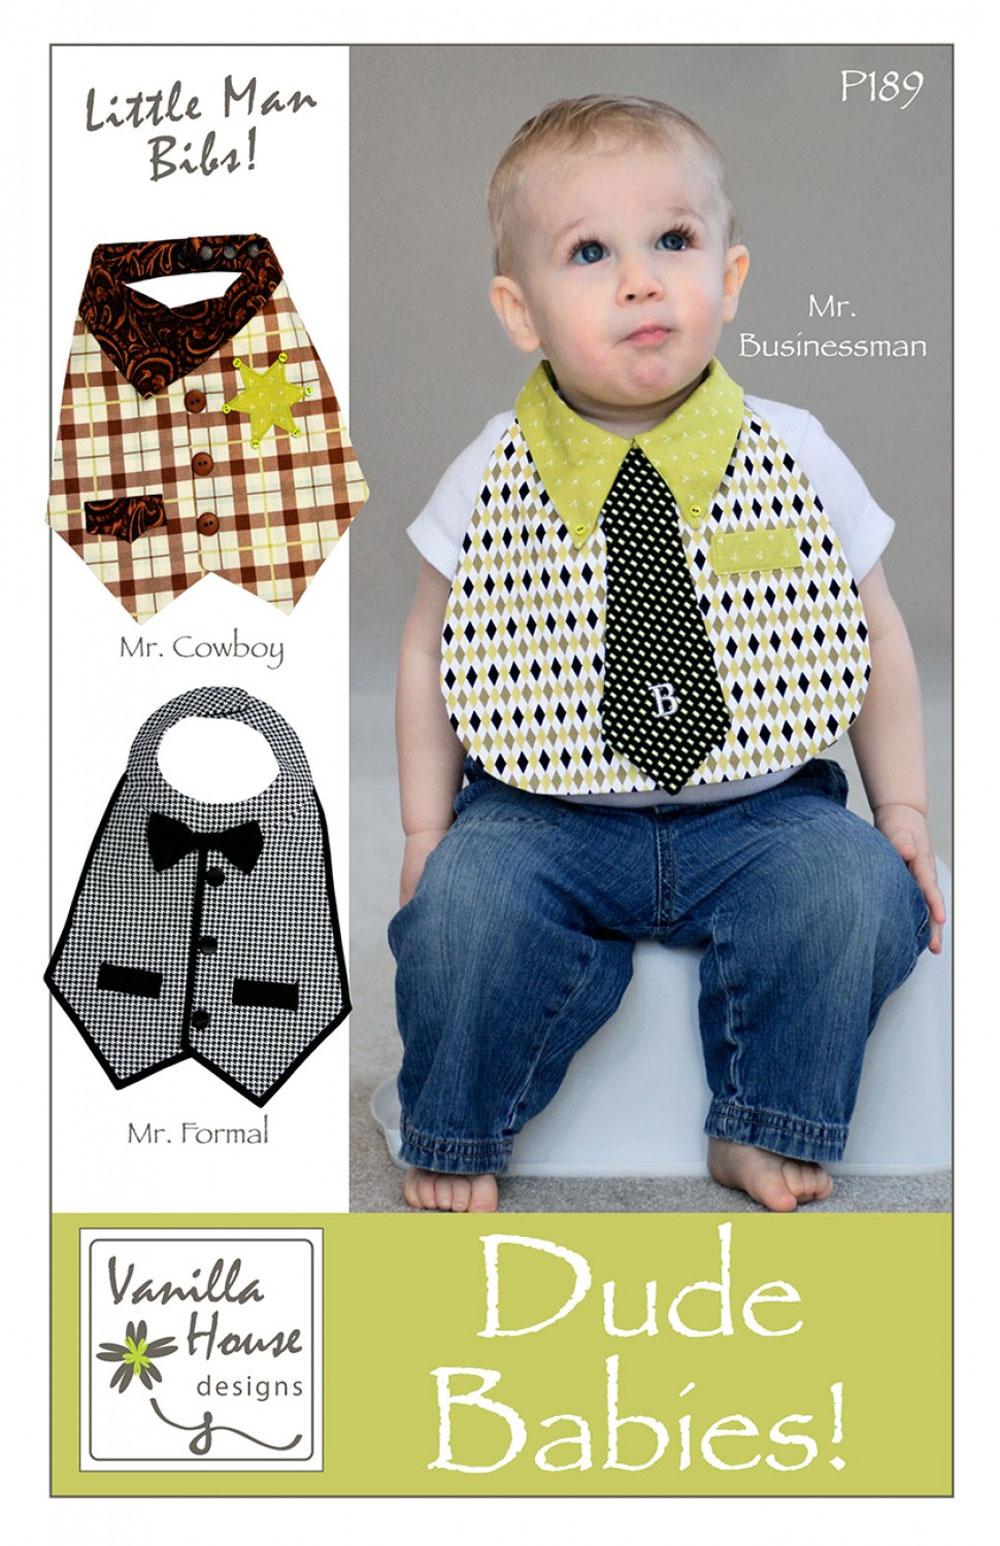 Dude-Babies-sewing-pattern-Vanilla-House-Designs-P189-front.jpg